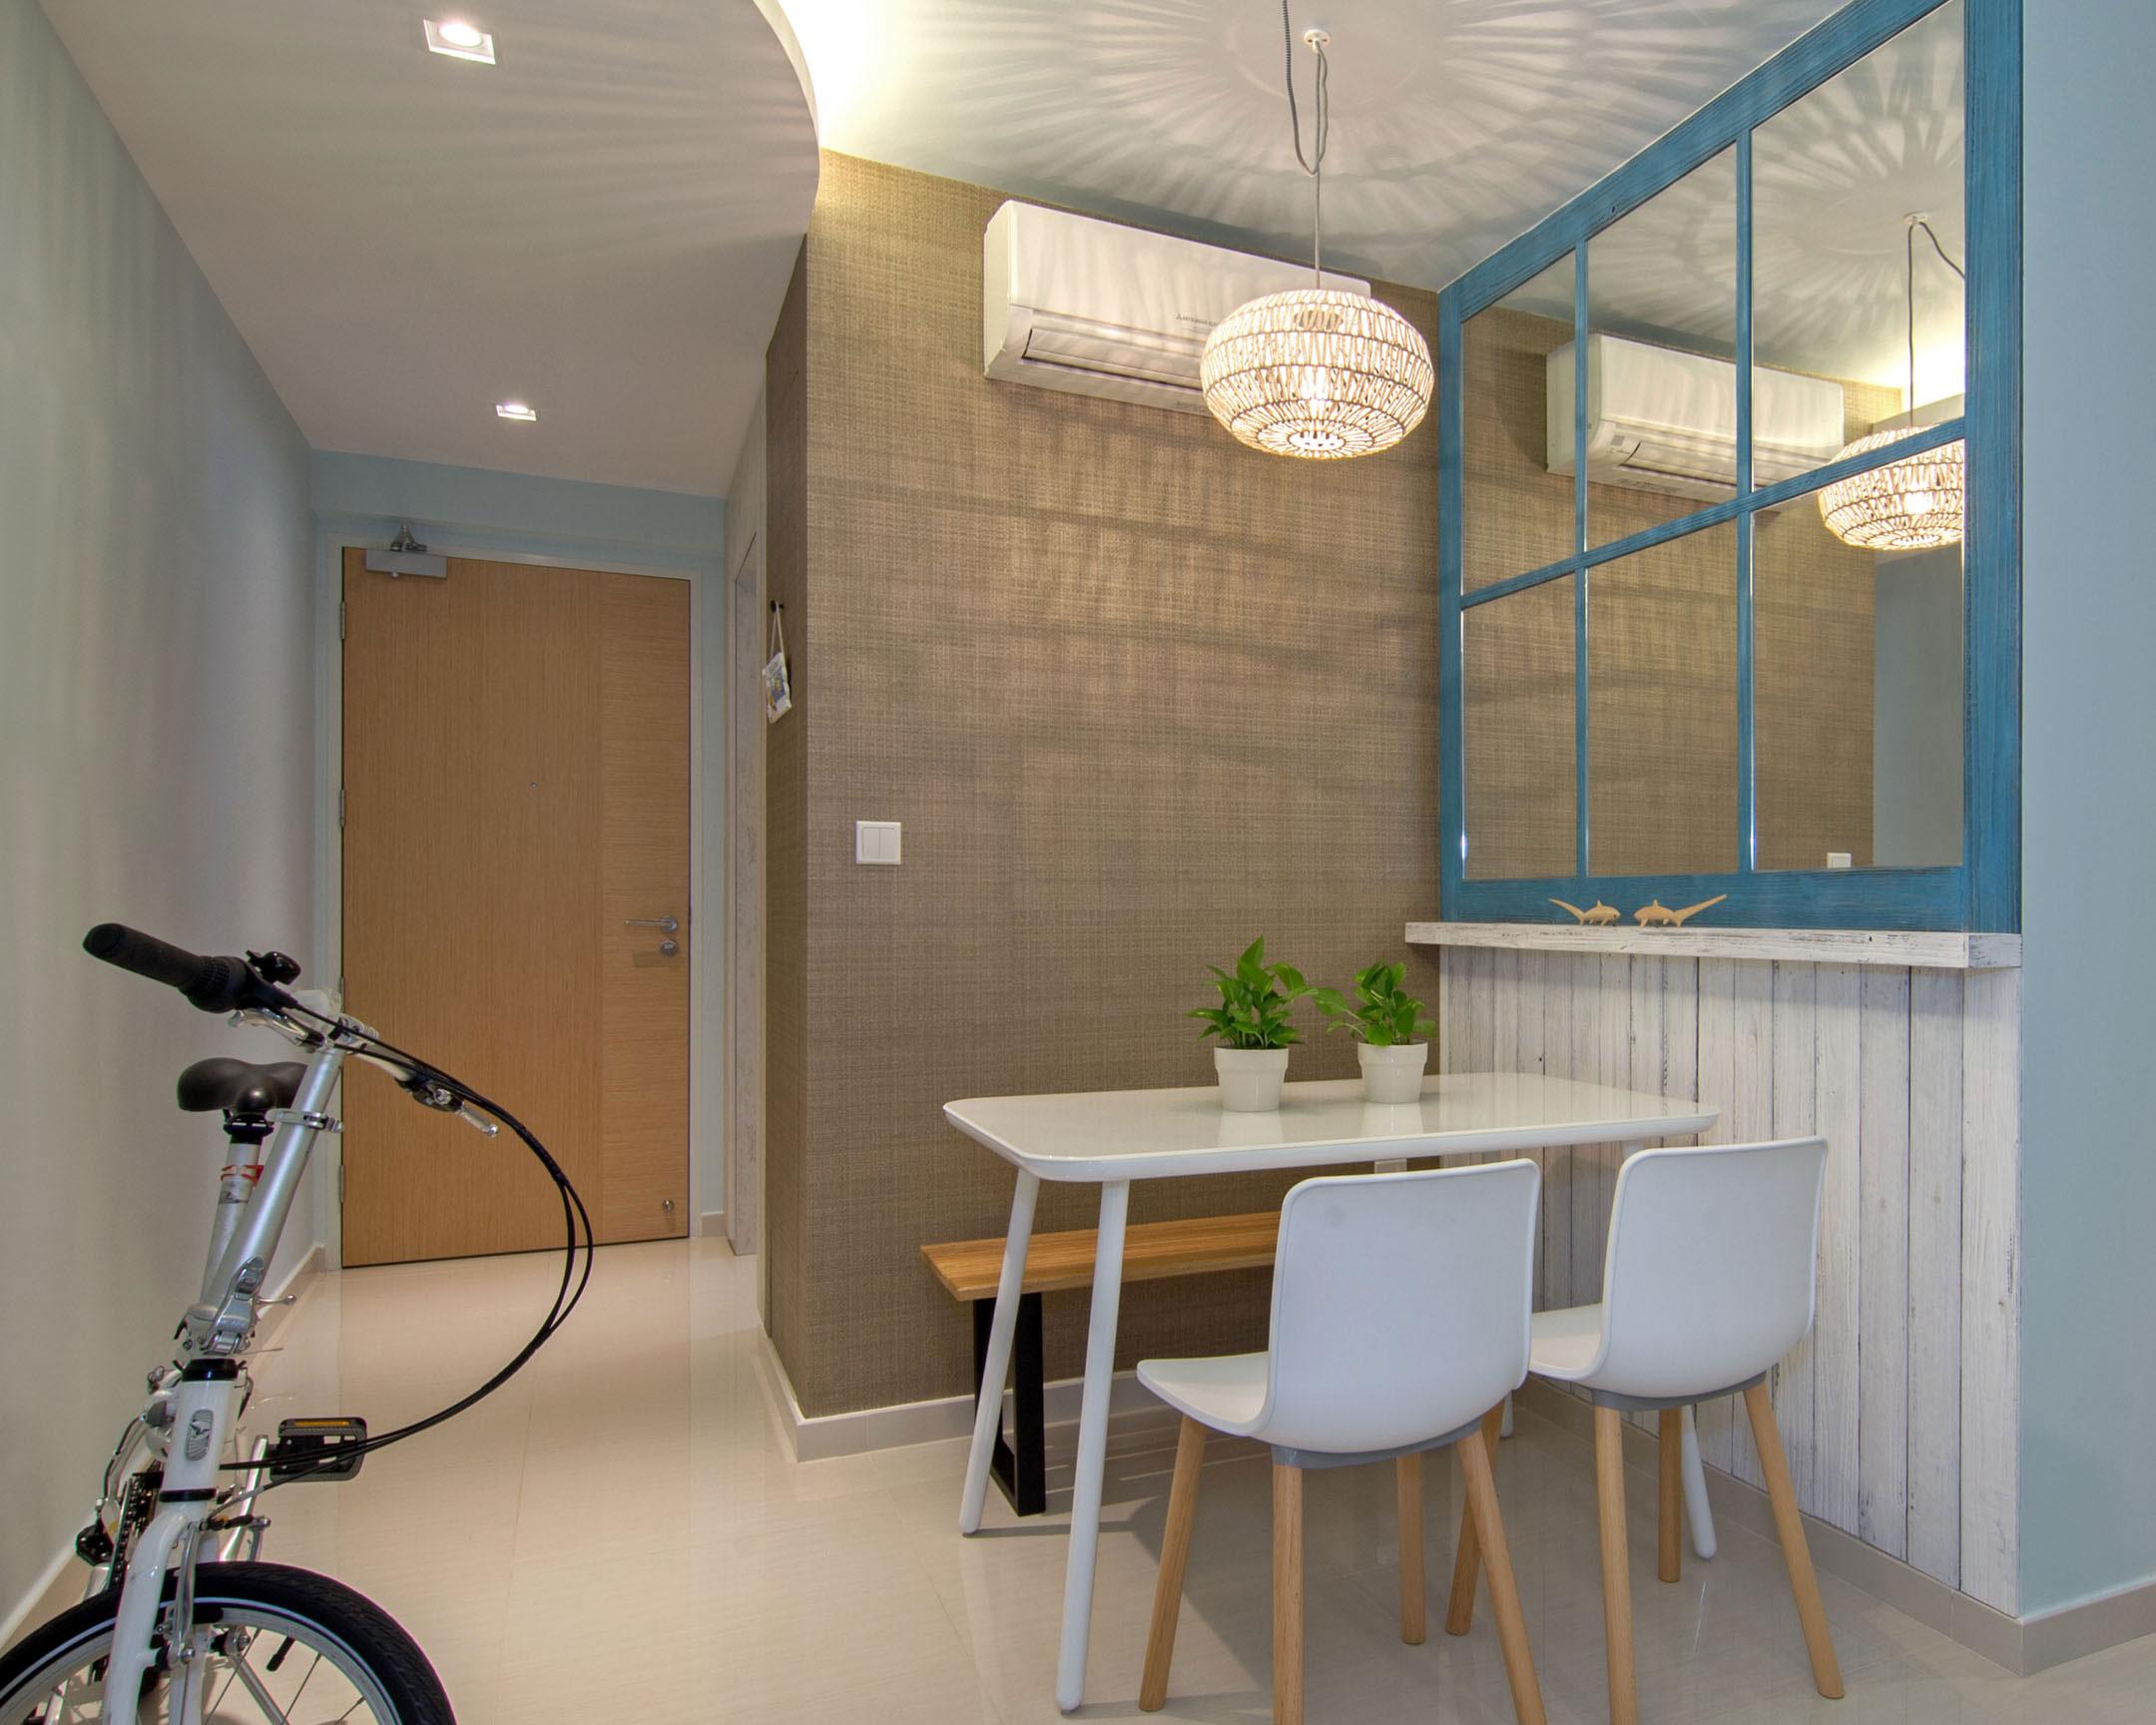 Beach house urban apartment in Singapore by Vievva Designers-10